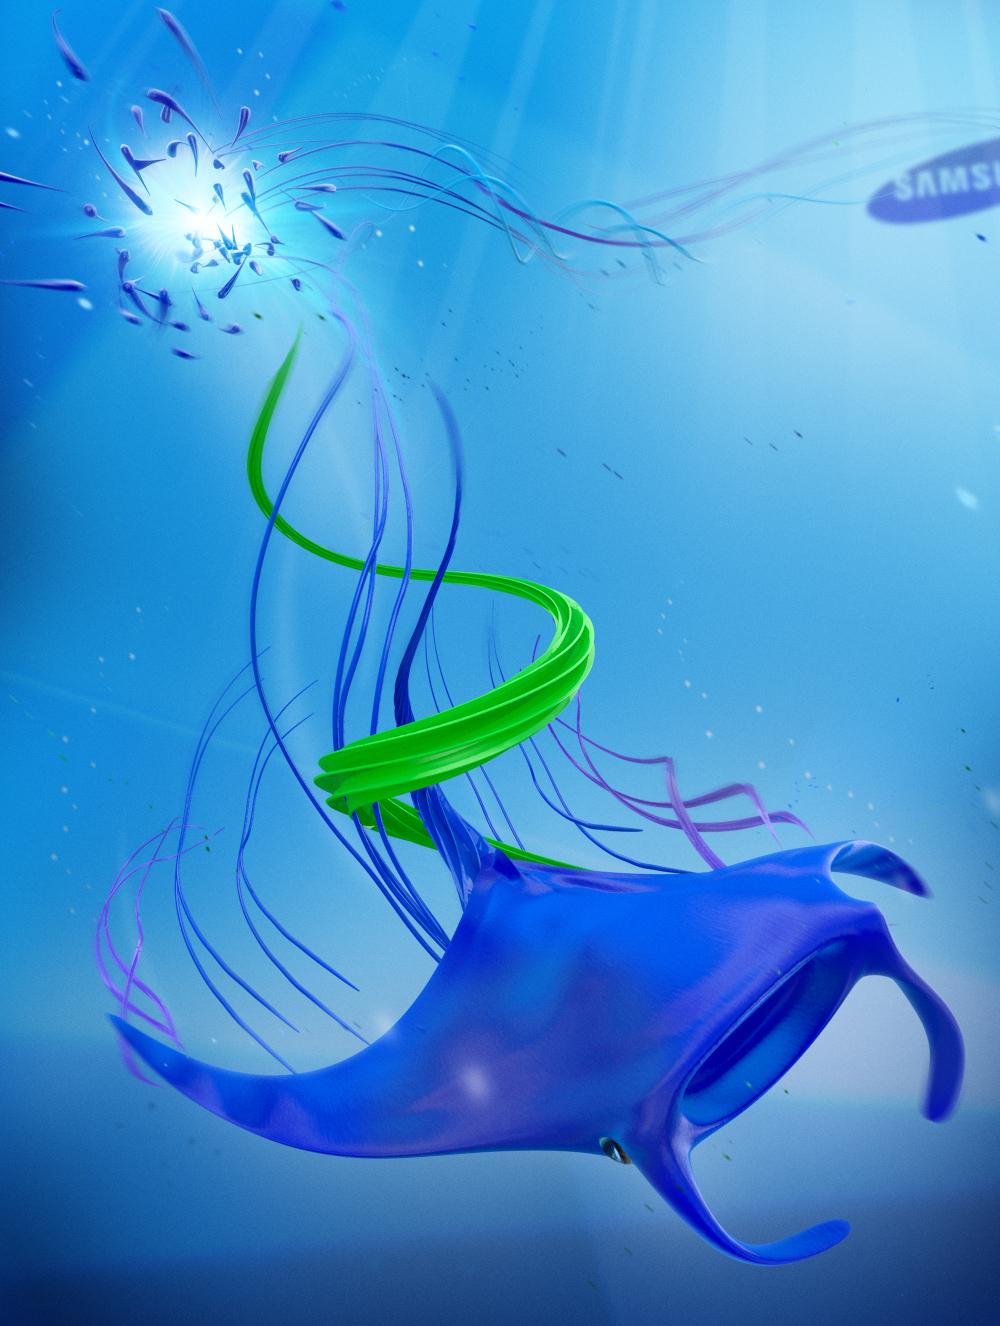 Samsung_water_002_v01